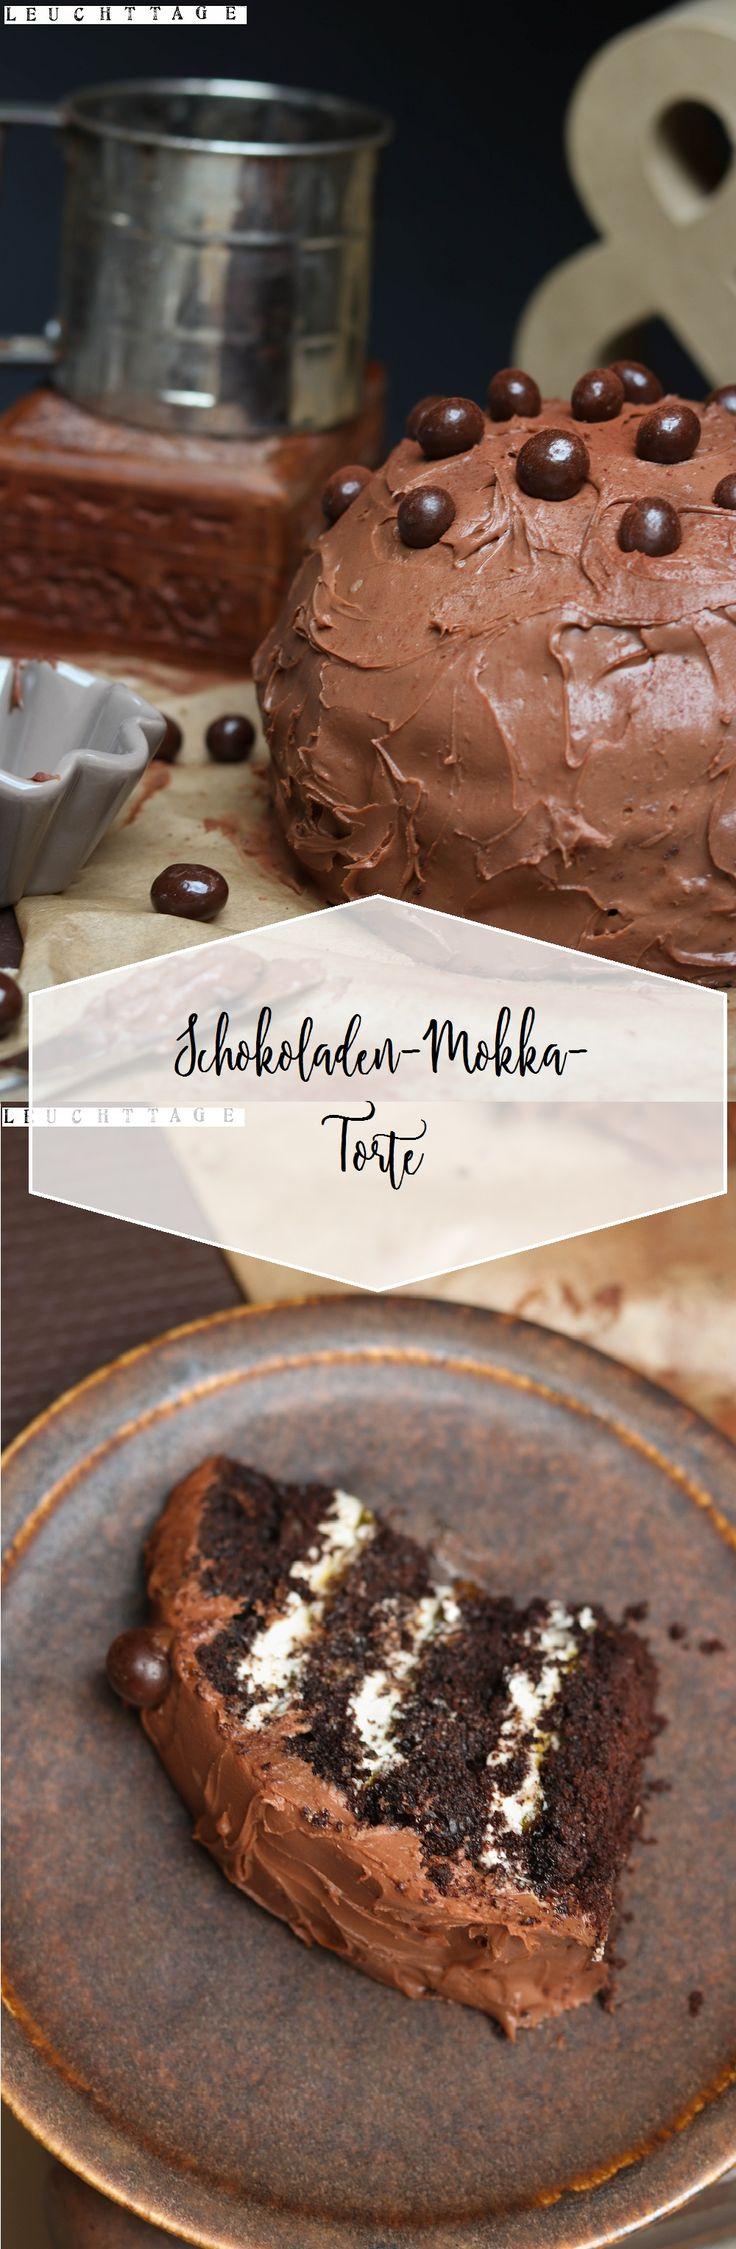 1000+ ideas about Mokka Kaffee on Pinterest.